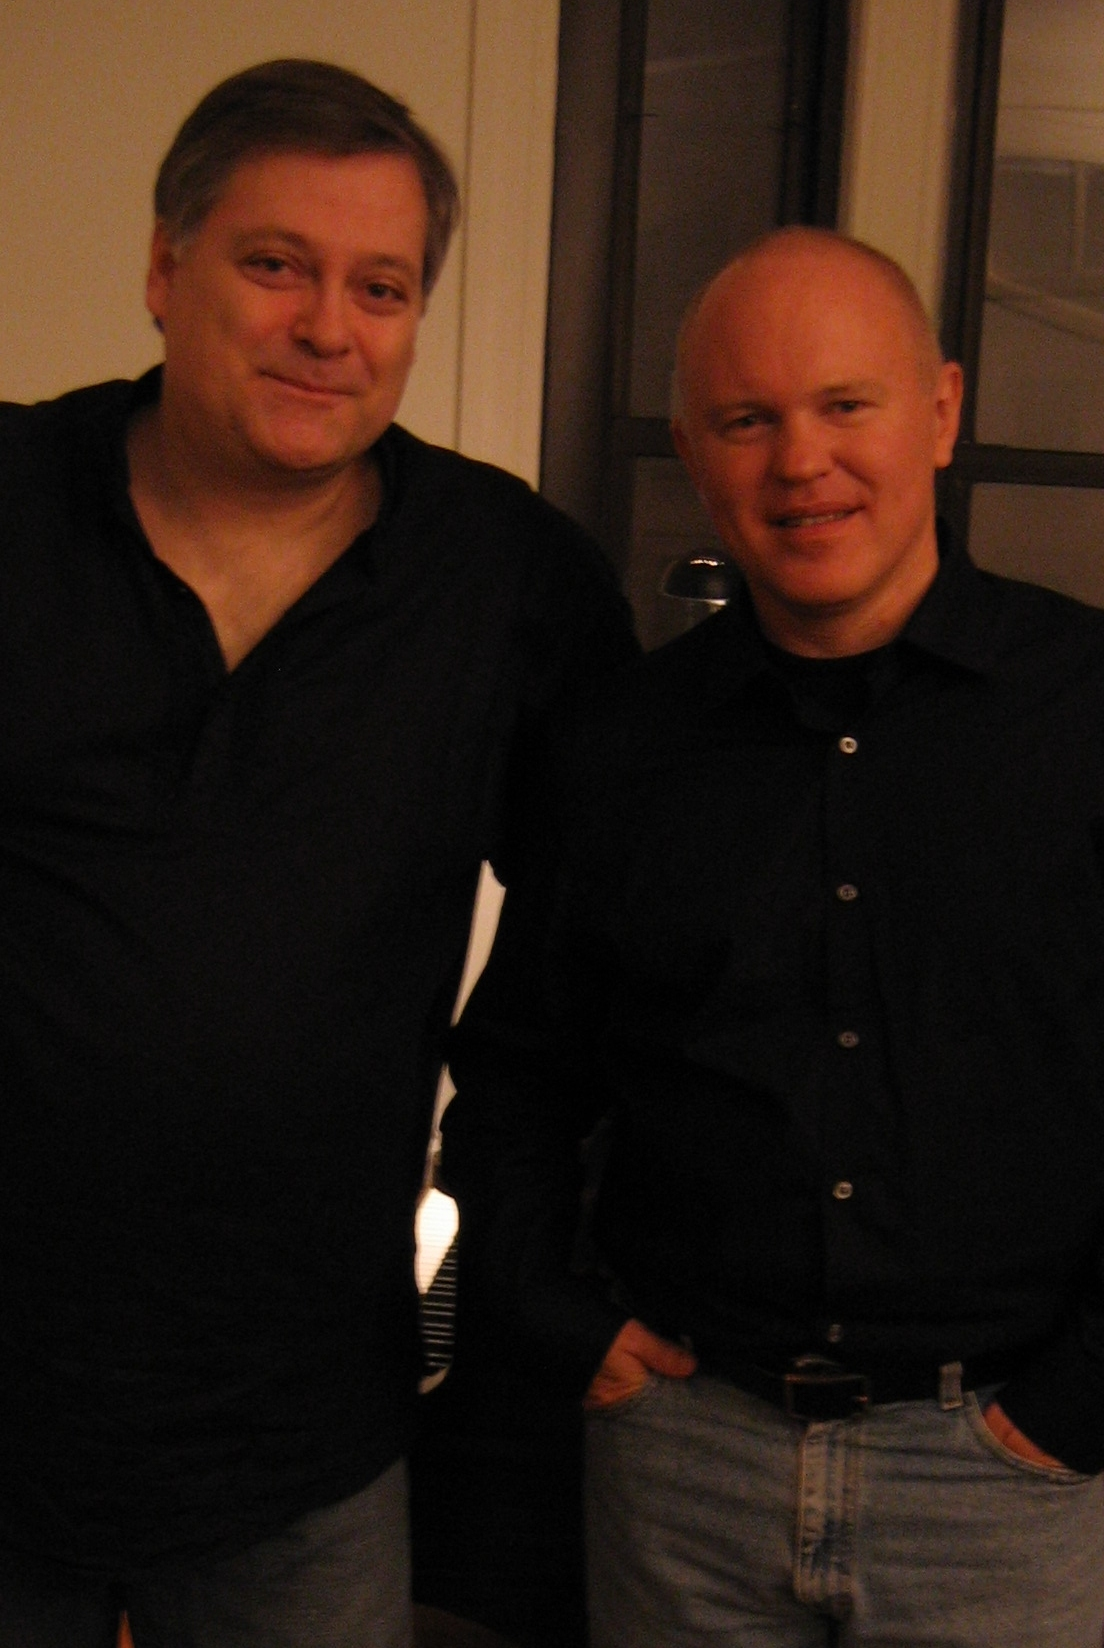 Daron Hagen and Michael Torke. New York City, fall, 2009. (Photo:Gilda Lyons)